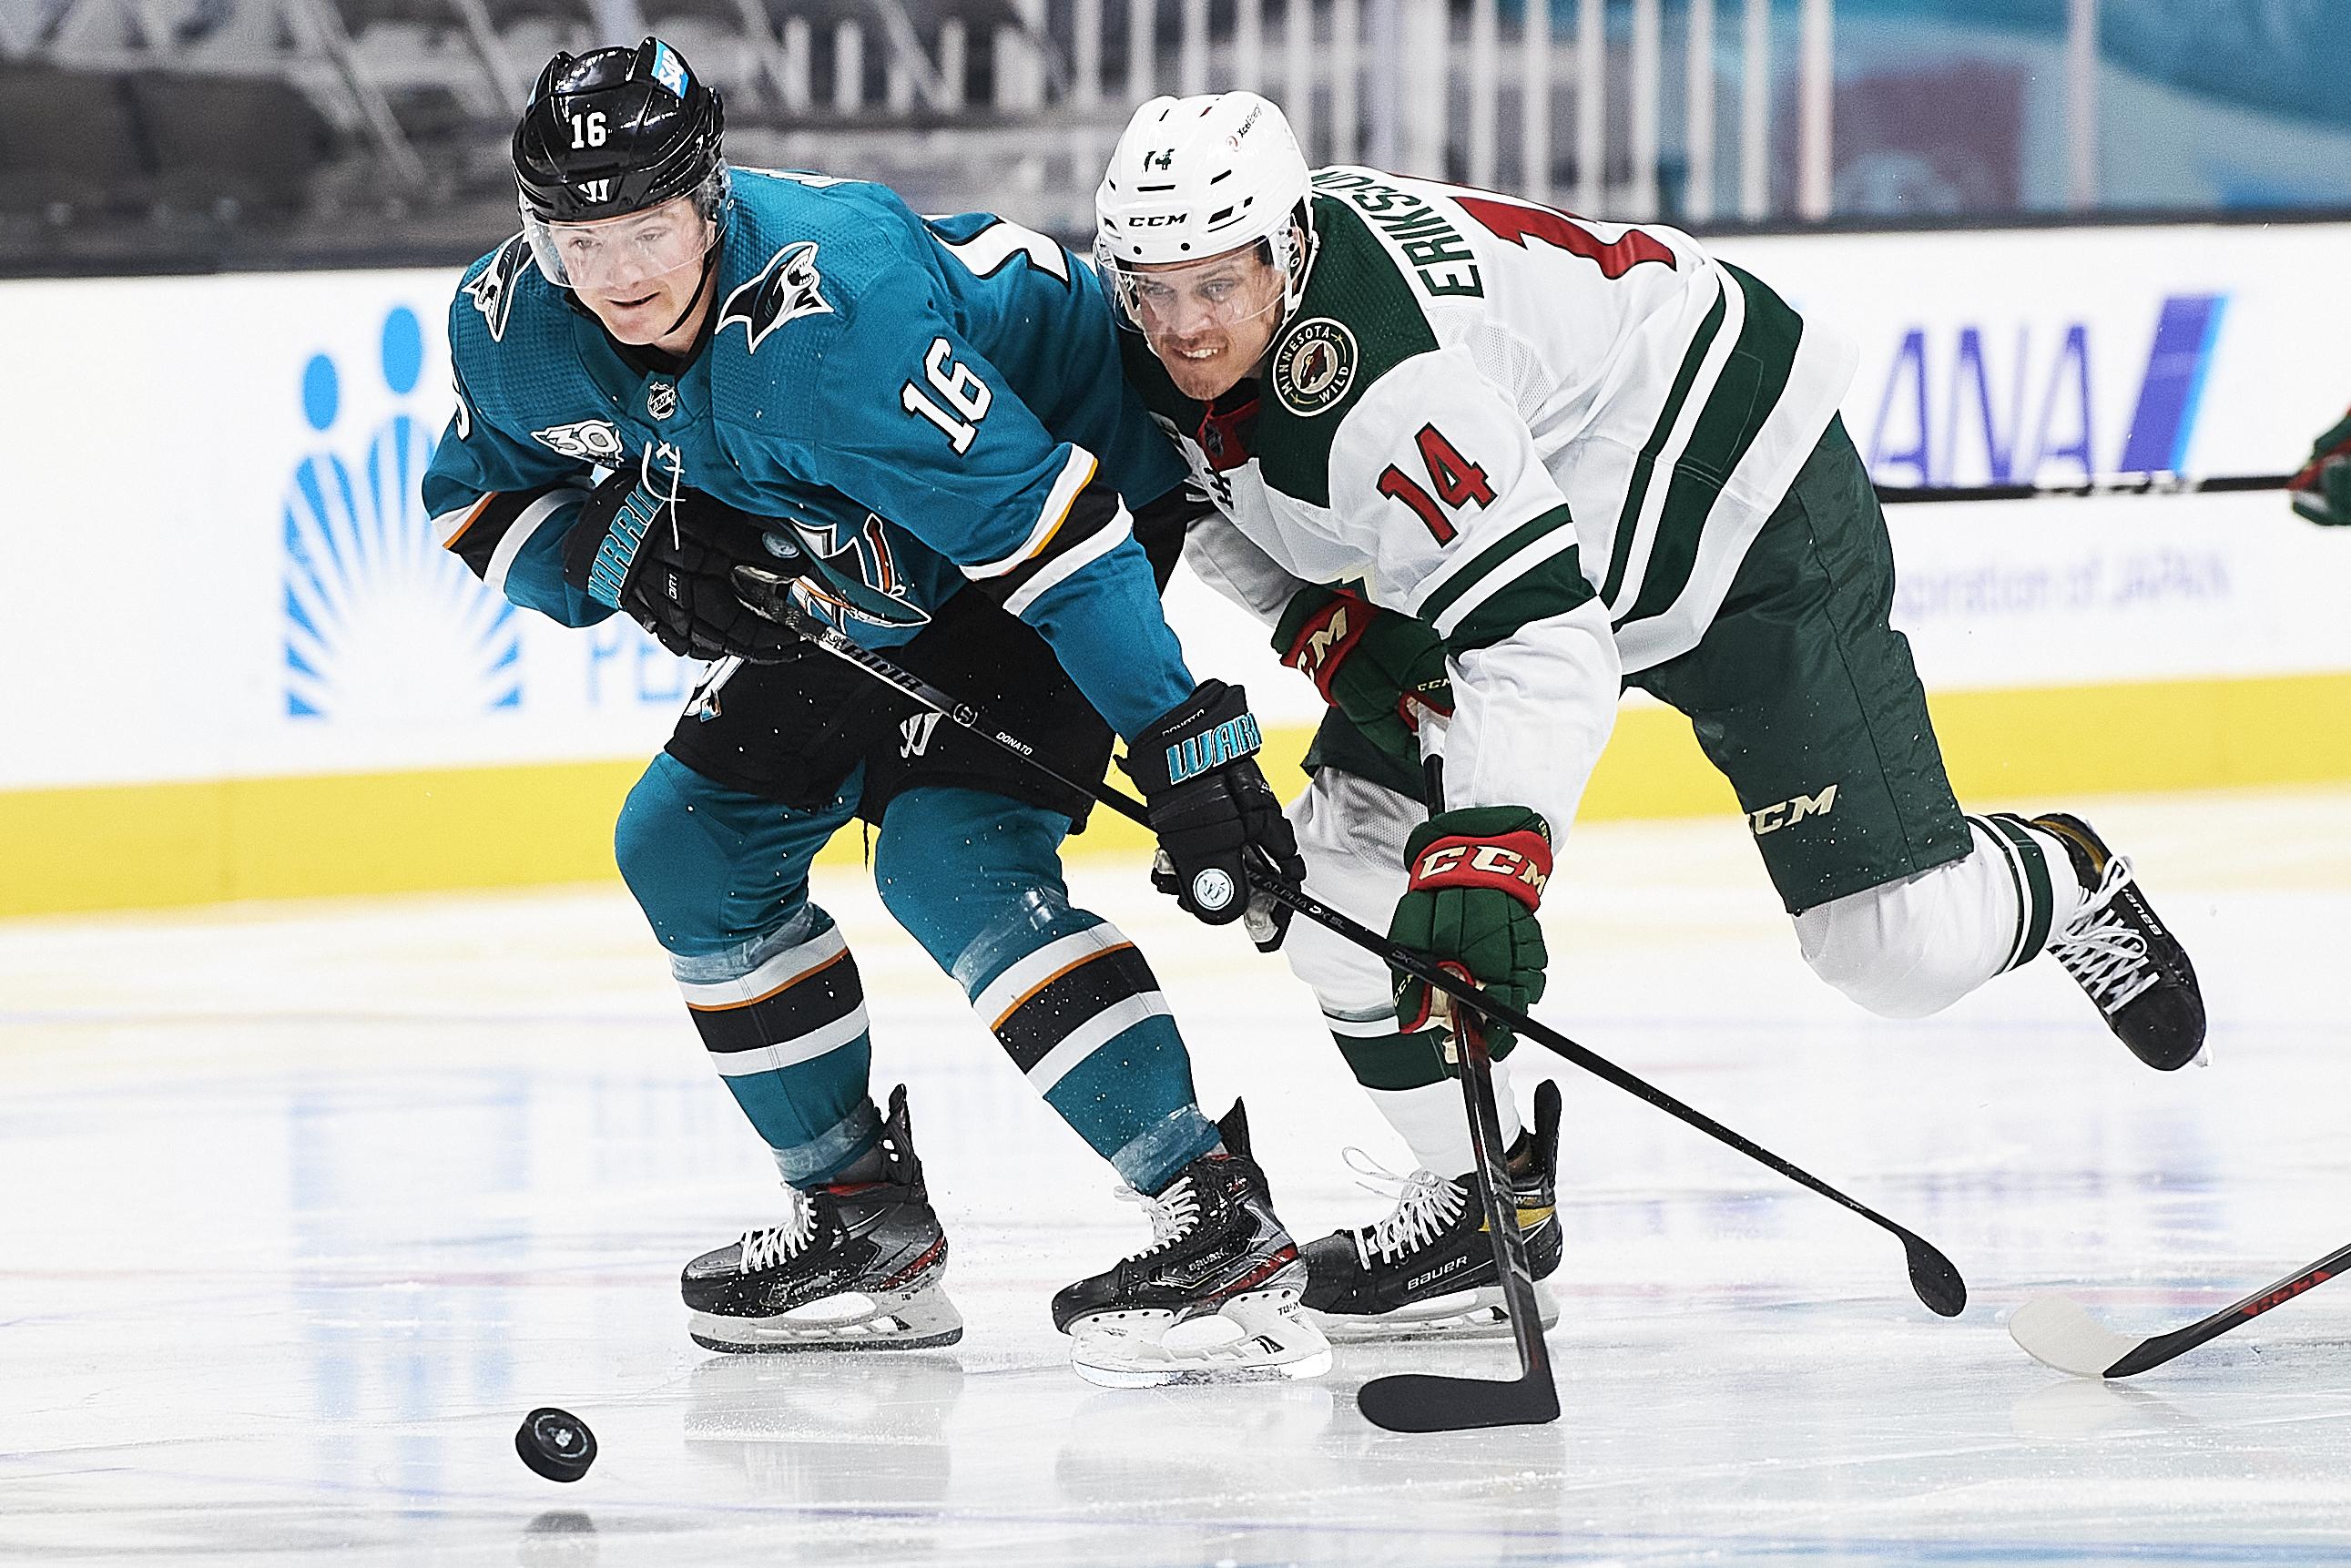 NHL: MAR 29 Wild at Sharks